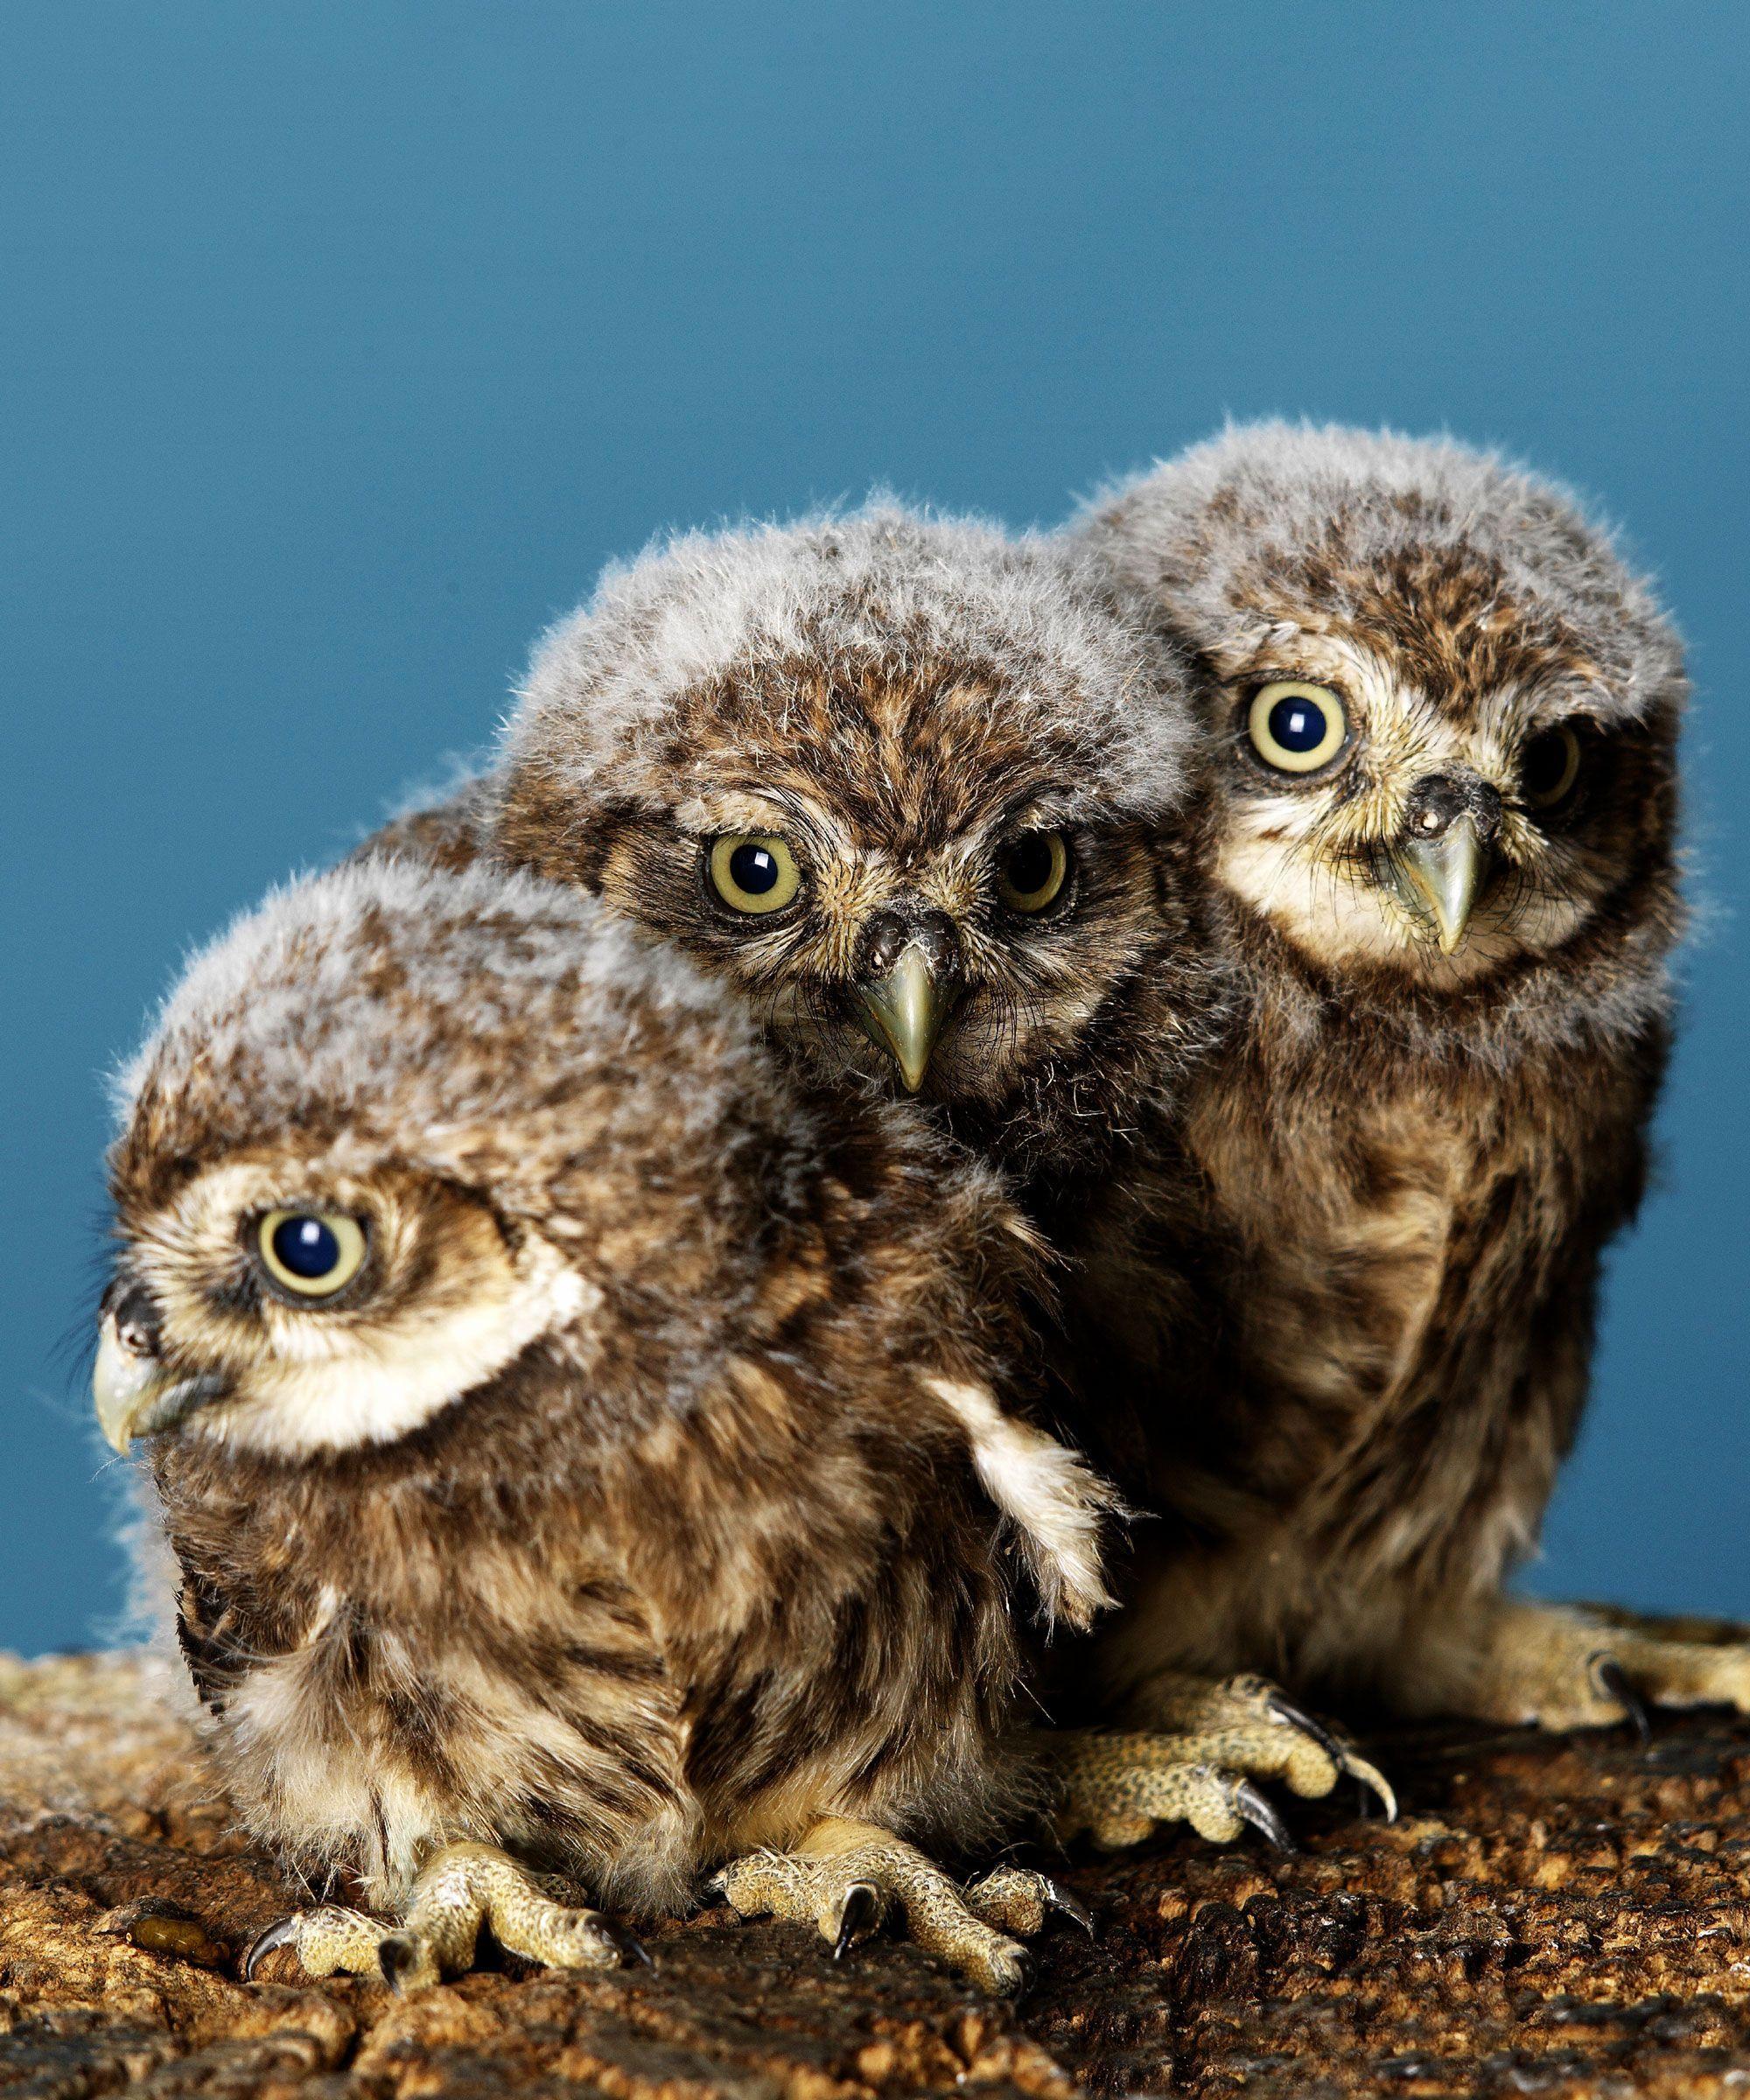 The Cafe Where You Can Sip Your Tea & Pet An Adorable Owl